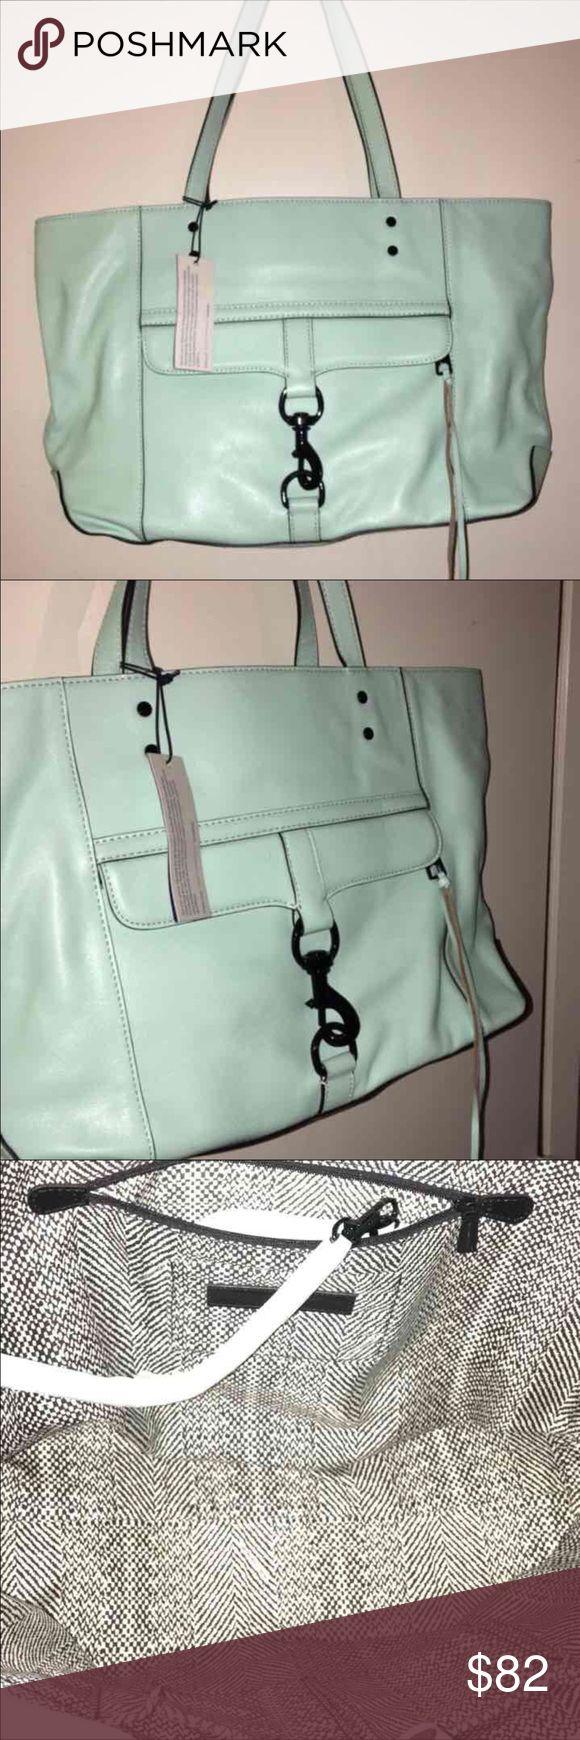 ‼️SALE SALE SALE‼️Rebecca Minkoff purse New never used Rebecca Minkoff purse. Mint color. Includes extra tassles. Perfect size. Original retail price $195. Open to offers. Rebecca Minkoff Bags Shoulder Bags